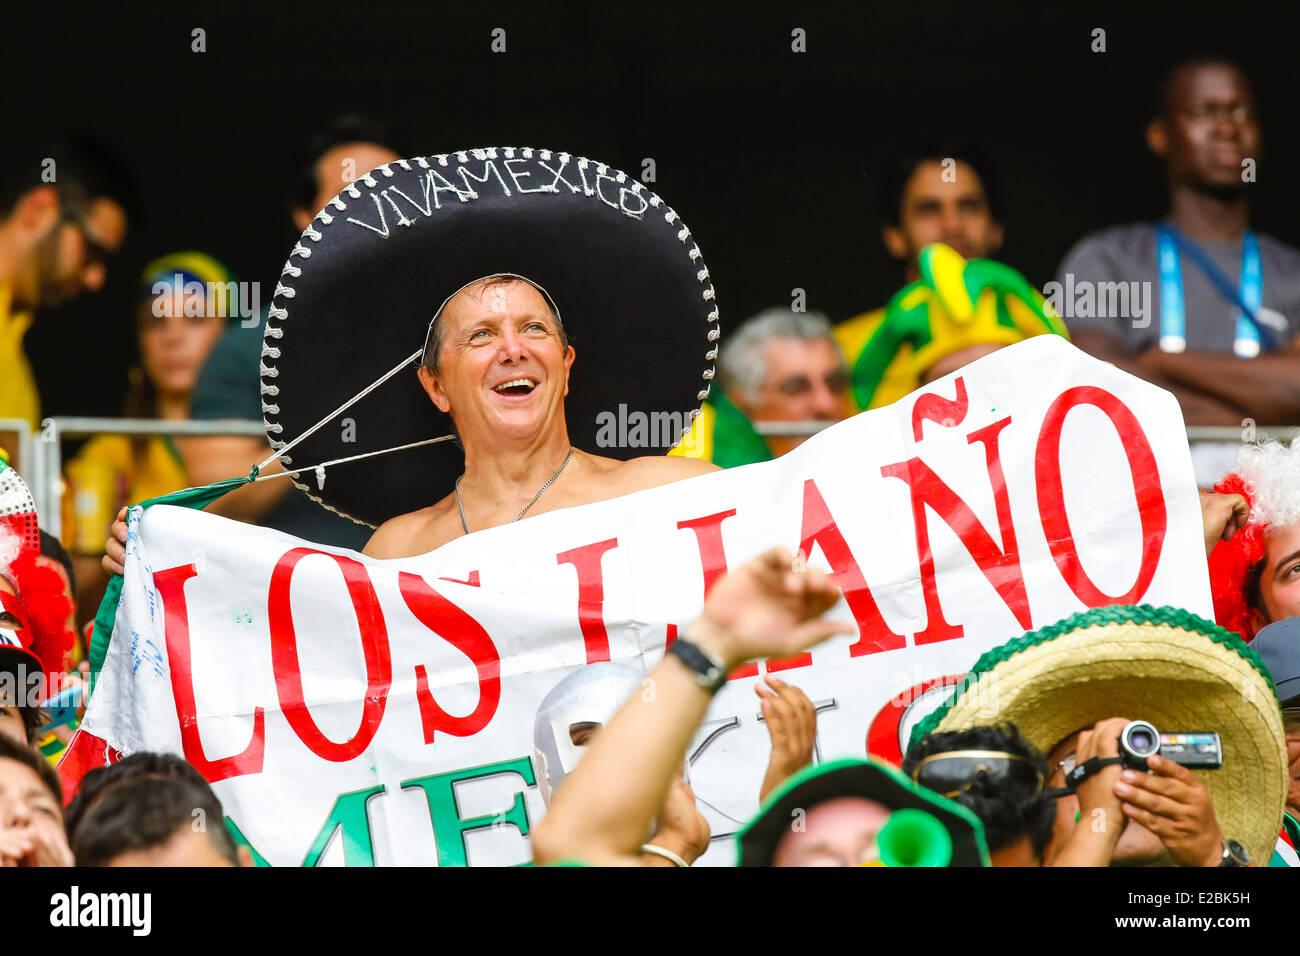 Fans, Fussballfans, supporters, spectators, Zuschauer, Jacke, Kutte, Weste, Fankurve Bemalung im Gesicht, Gesichtsbemalung, - Stock Image